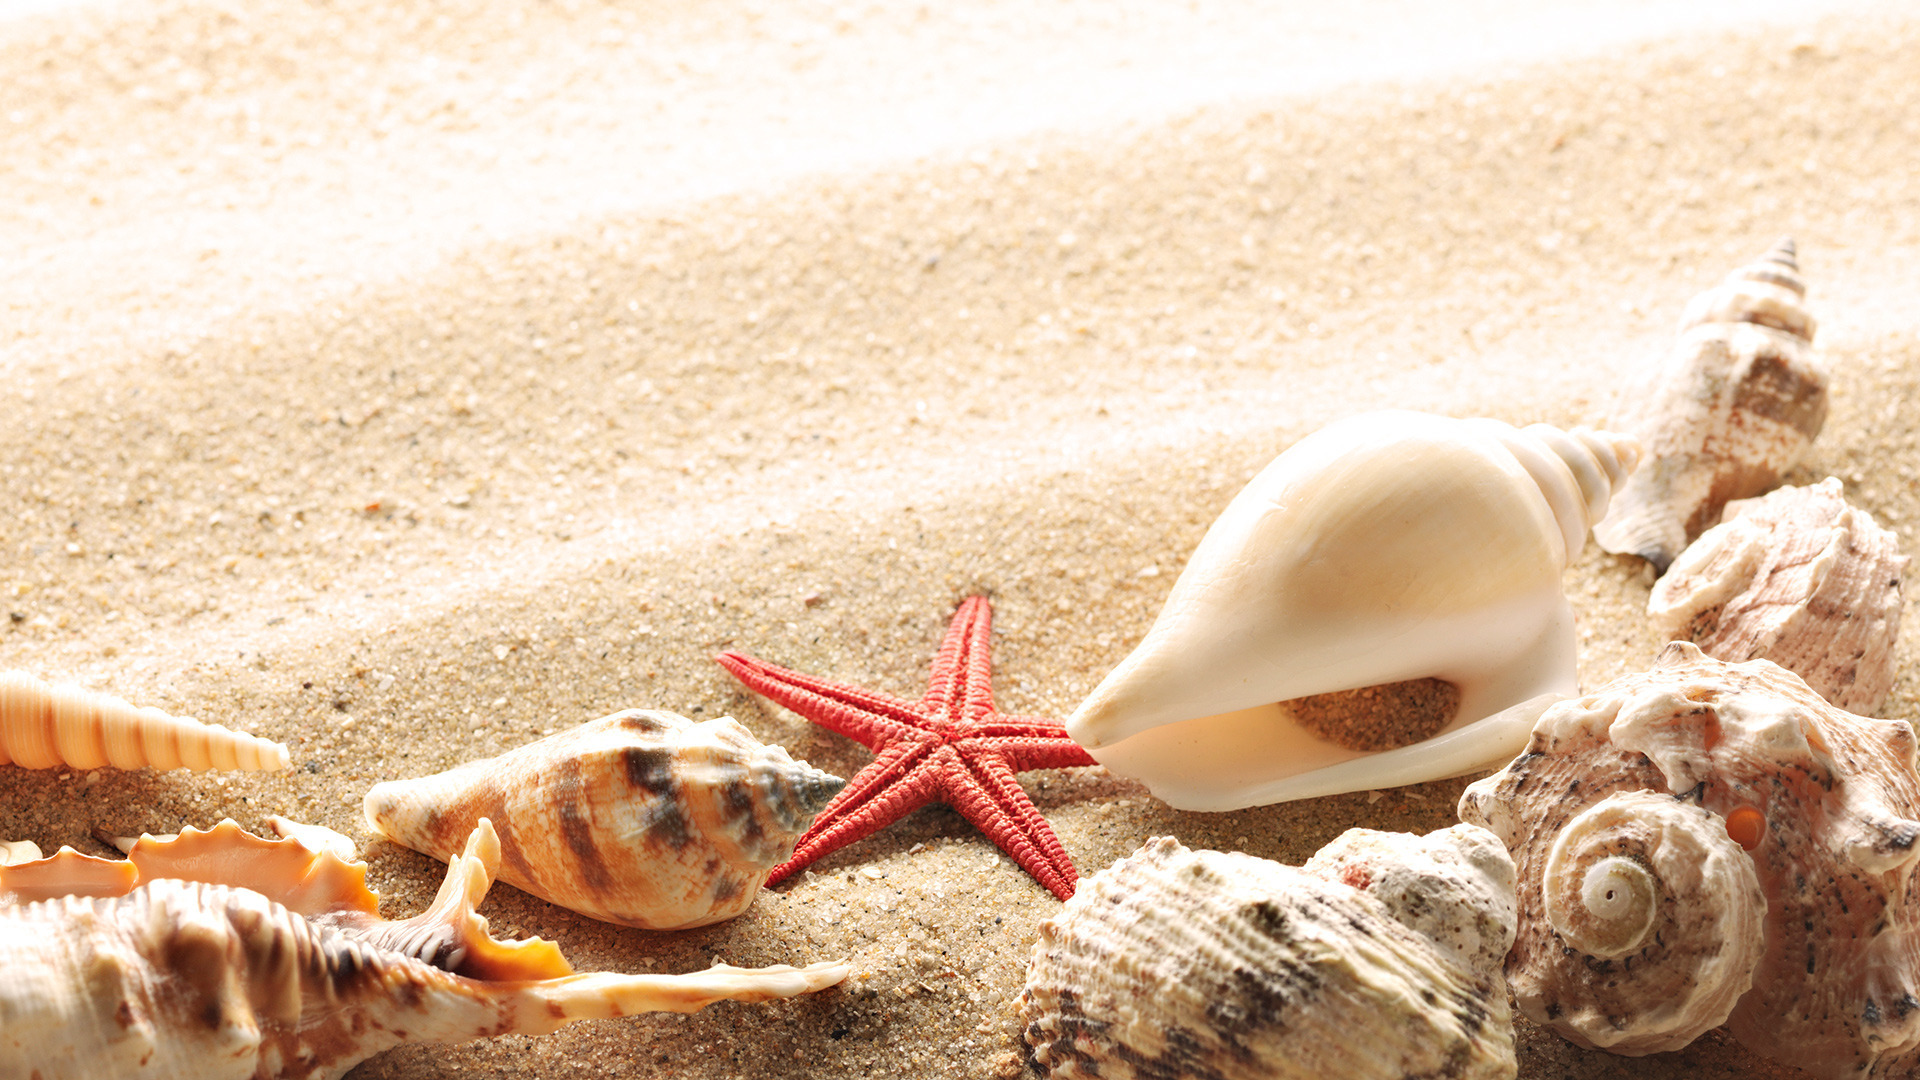 Wallpaper Seashells Summer Beach Sand Sun Theme Macro Download 132777 1920x1080